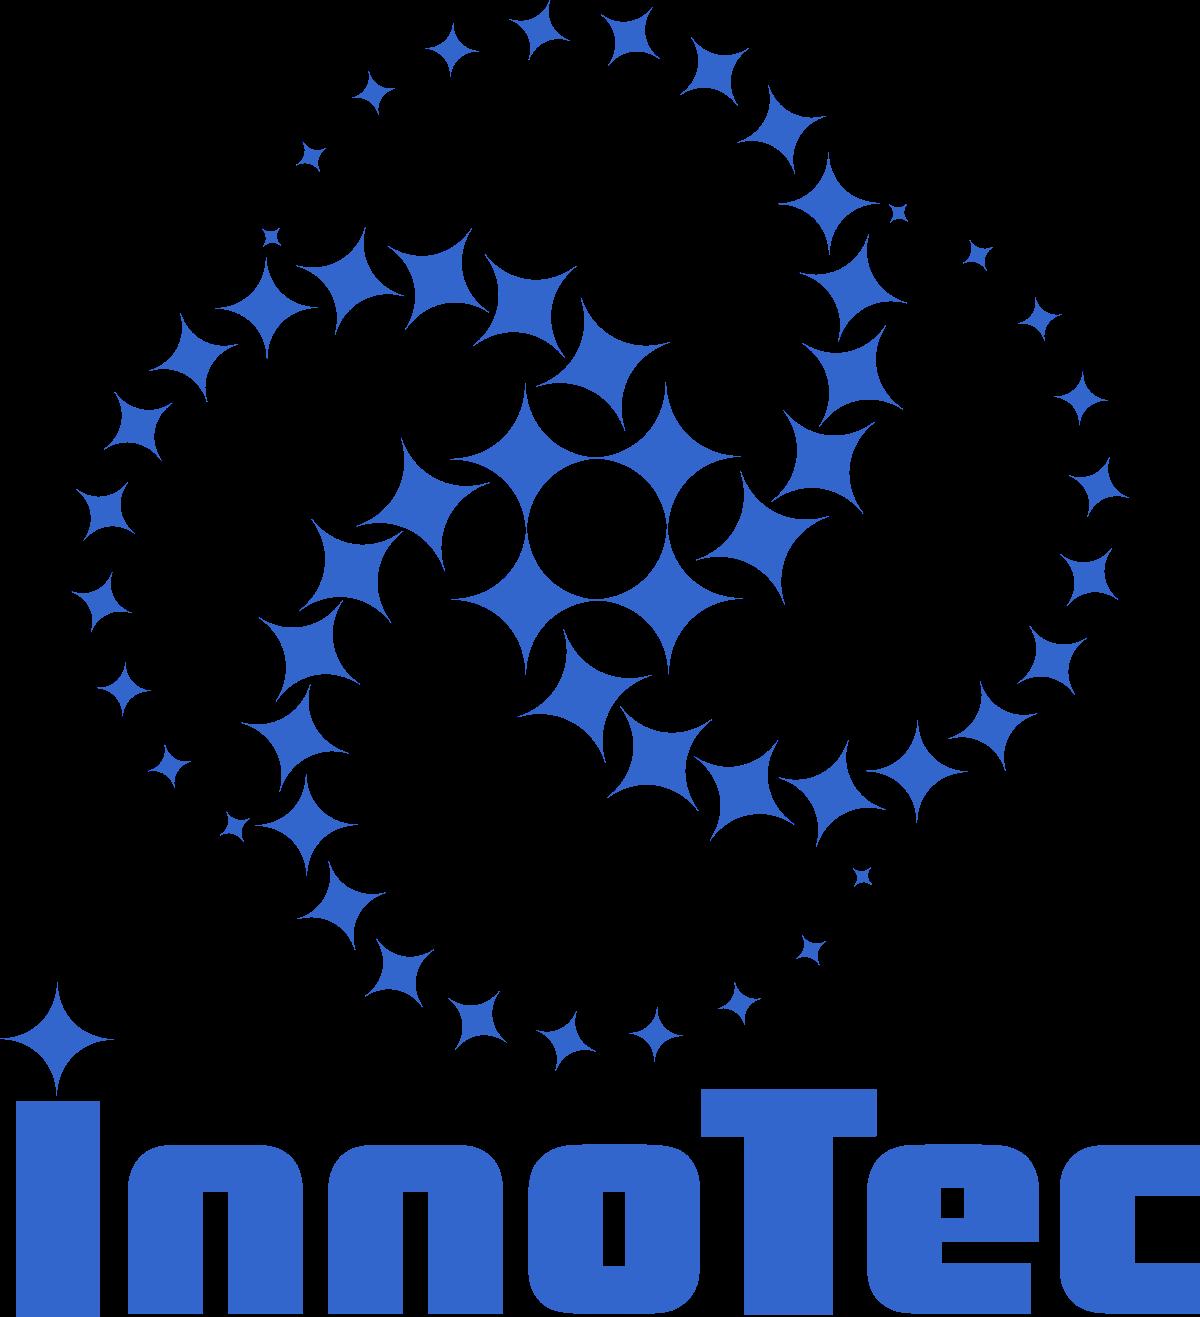 logo_eng_blue